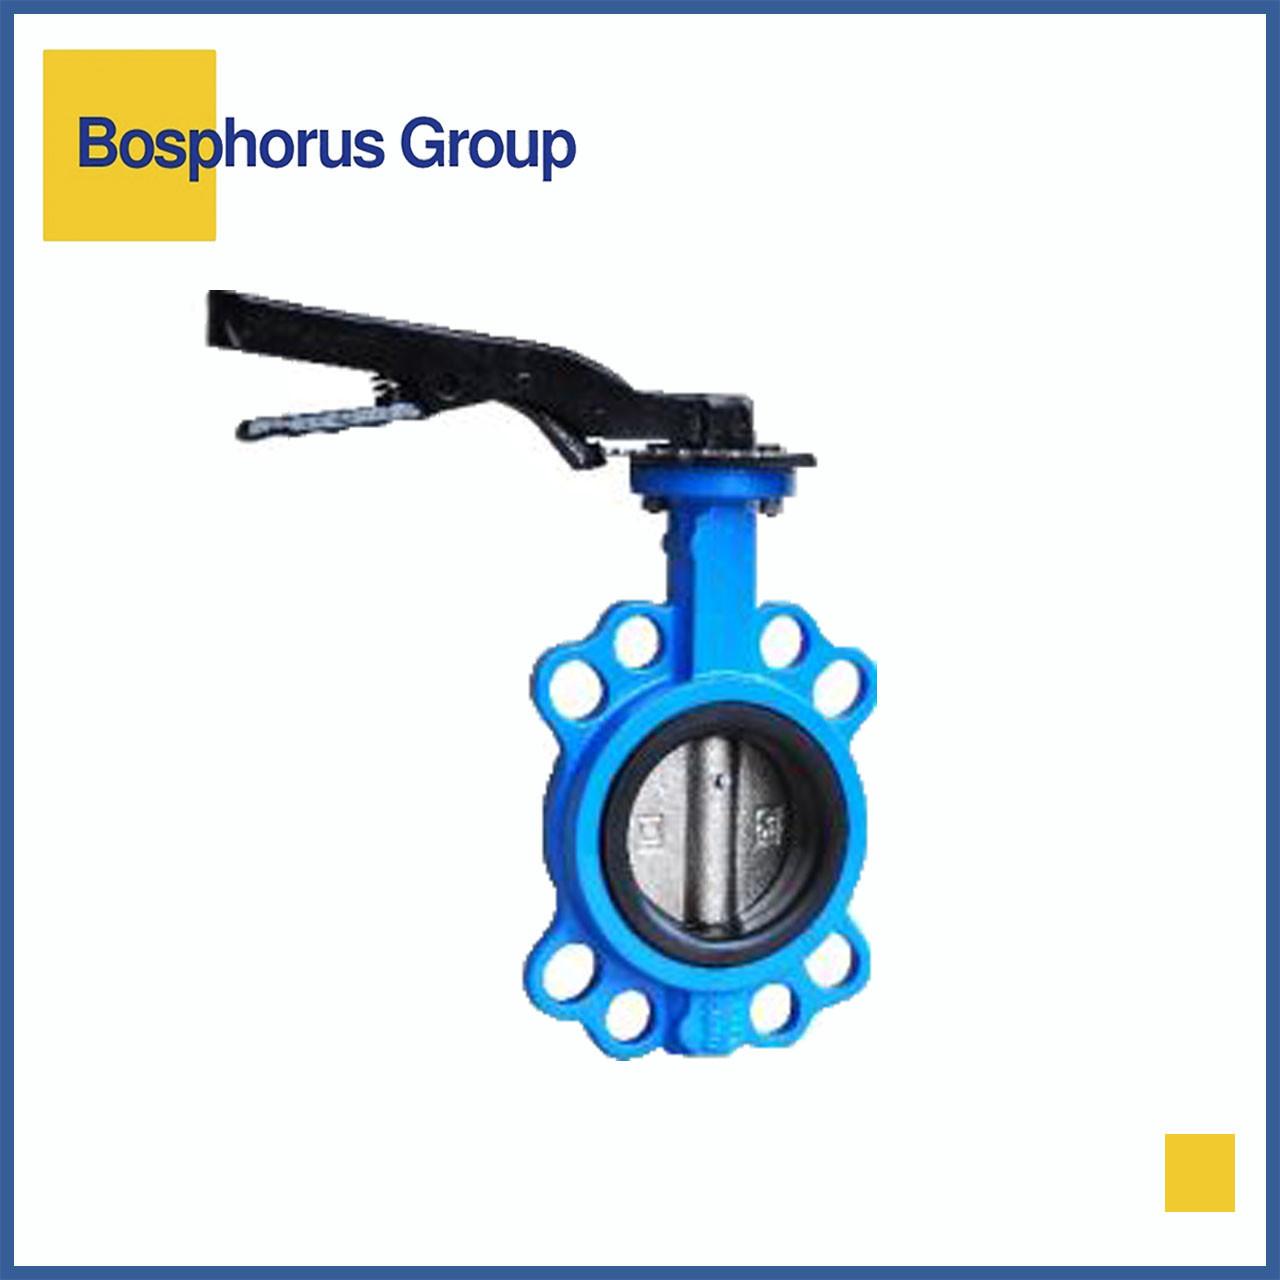 Затвор дисковый межфланцевый Ду 100 Ру 16 Brandoni, 32ч1р (Вода, +120)